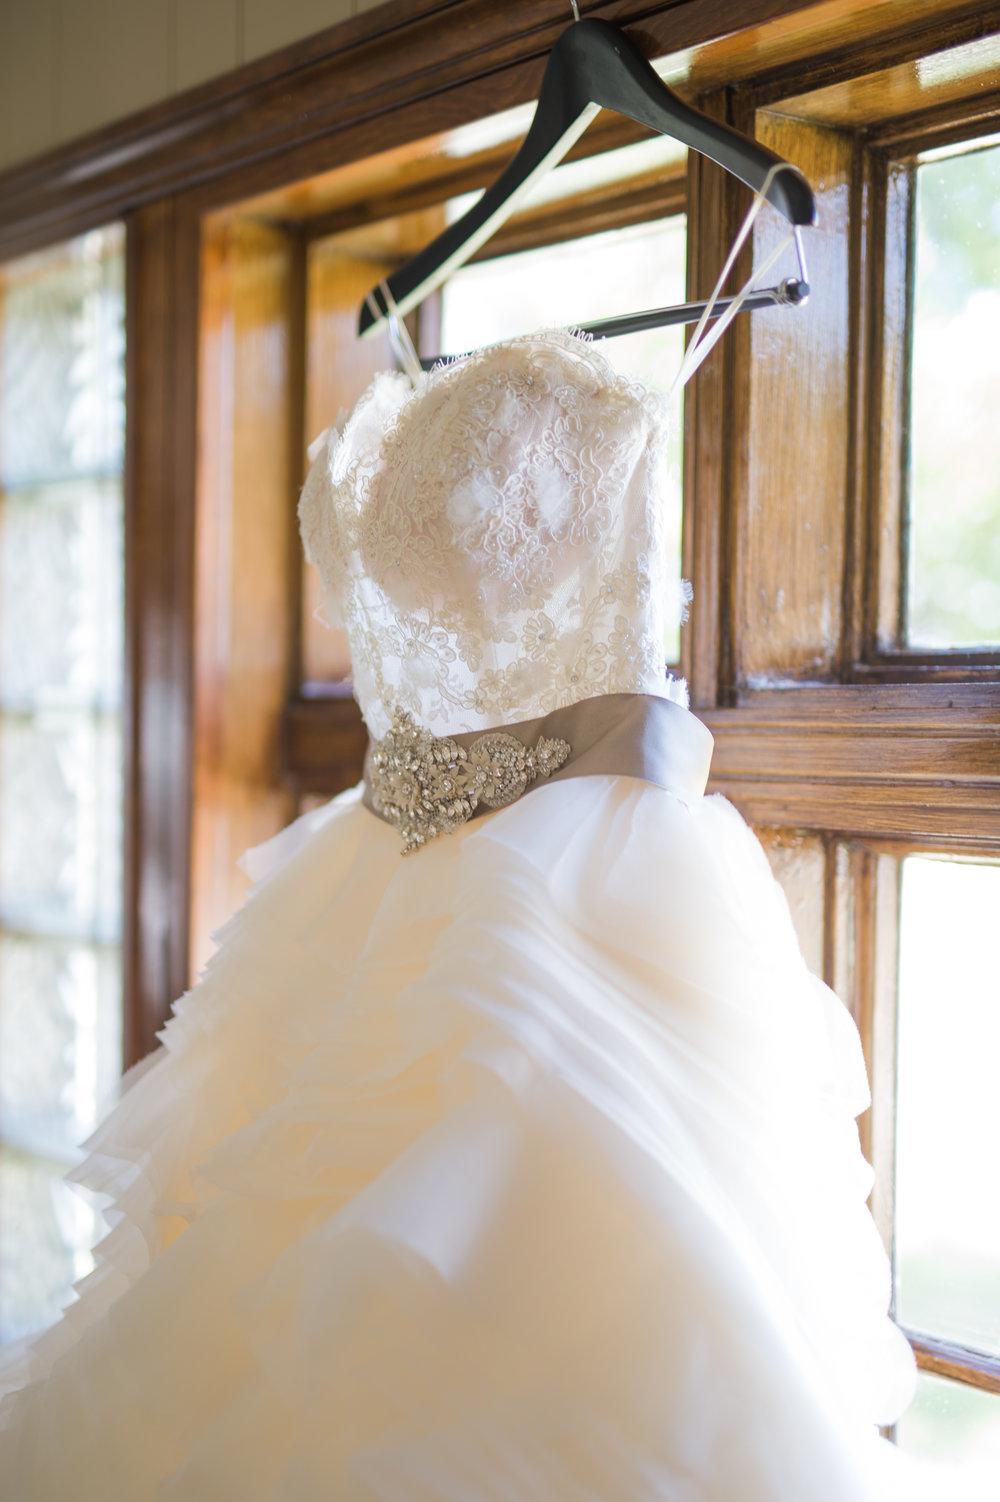 Amarillo Brides, Parie designs, Wedding dresses, Wedding coordination and design